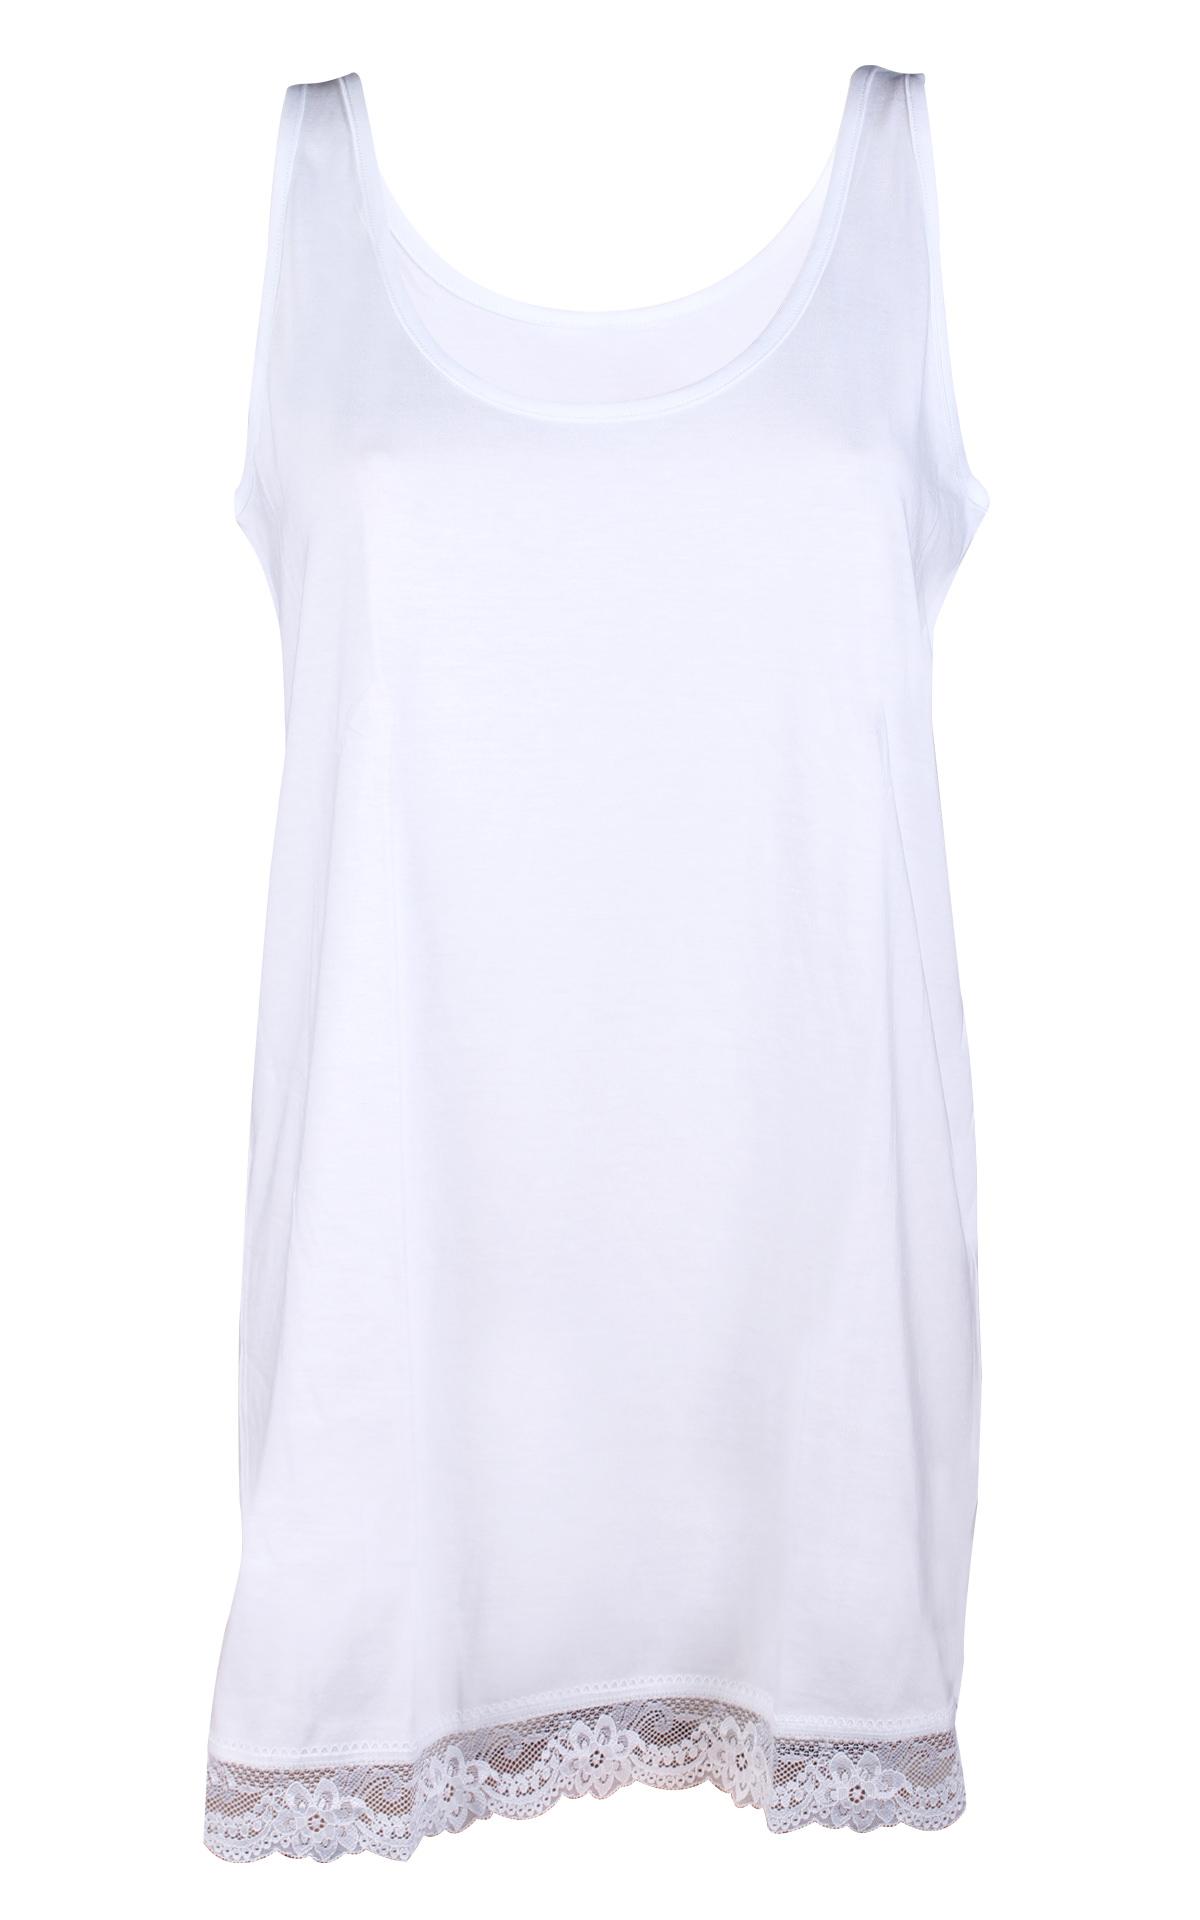 d029d2023c2f Γυναίκα Outwear   BeachWear Top Top Modal Lace